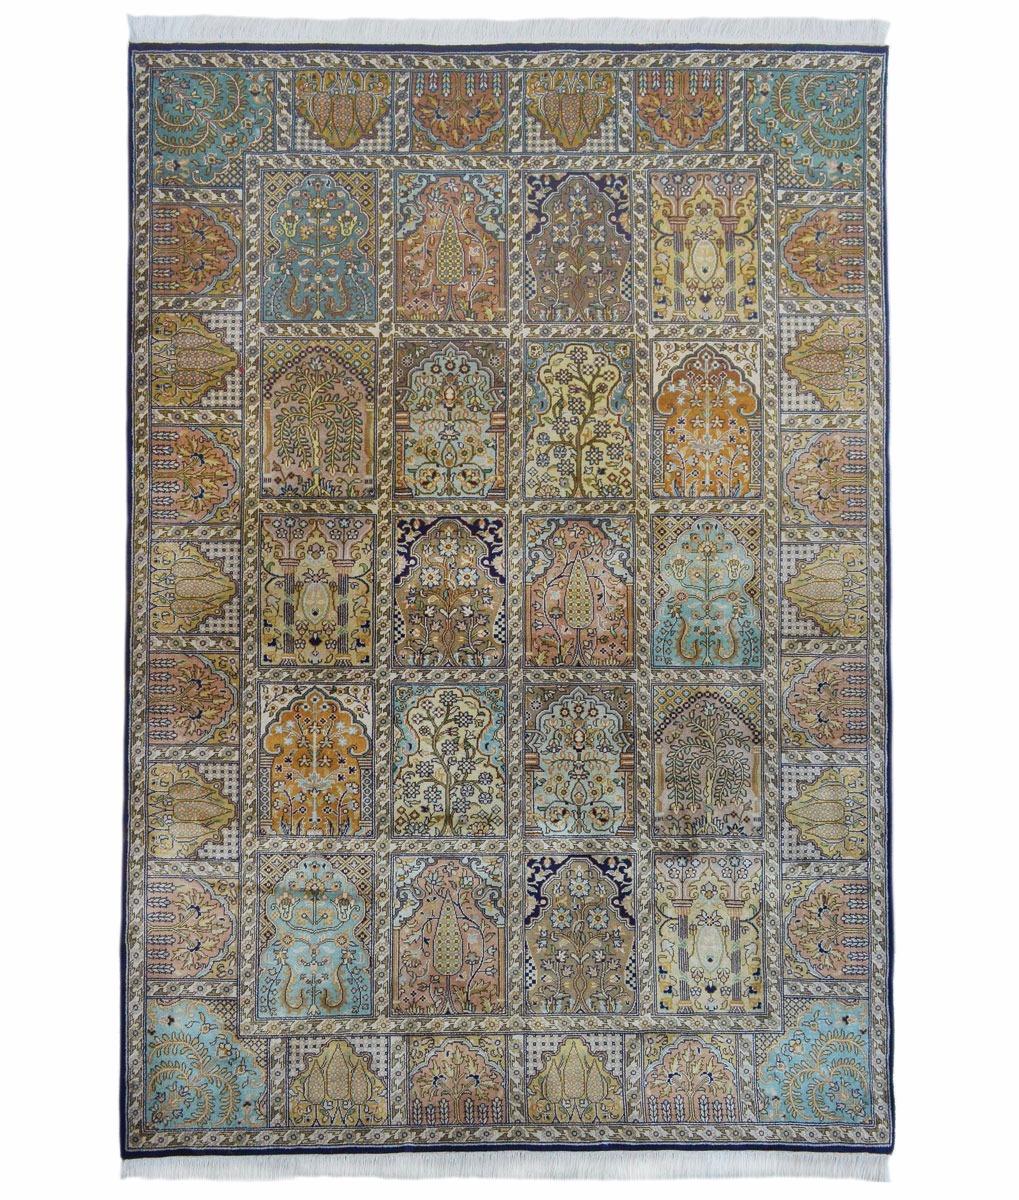 Hand woven silk pile carpet - 124 x 186cm